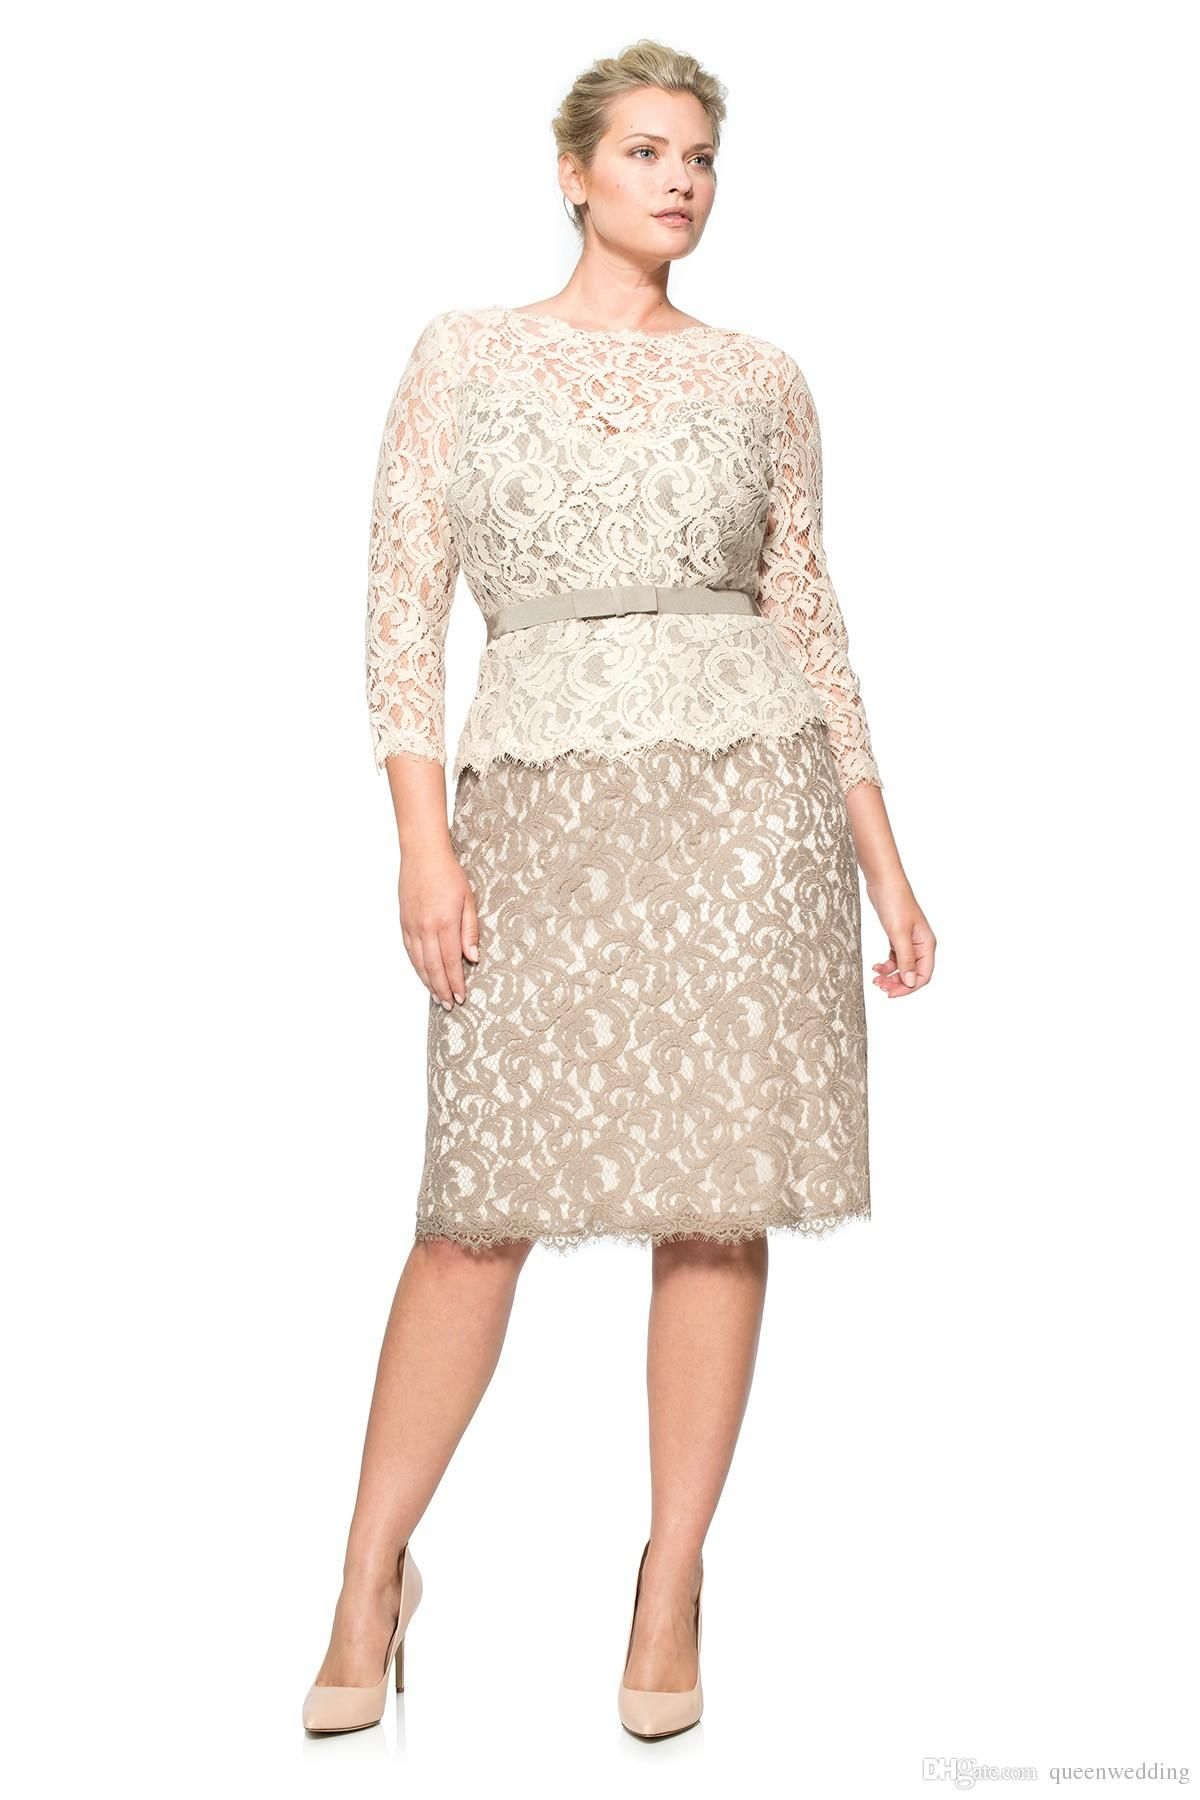 Mother Groom Dresses Plus Size